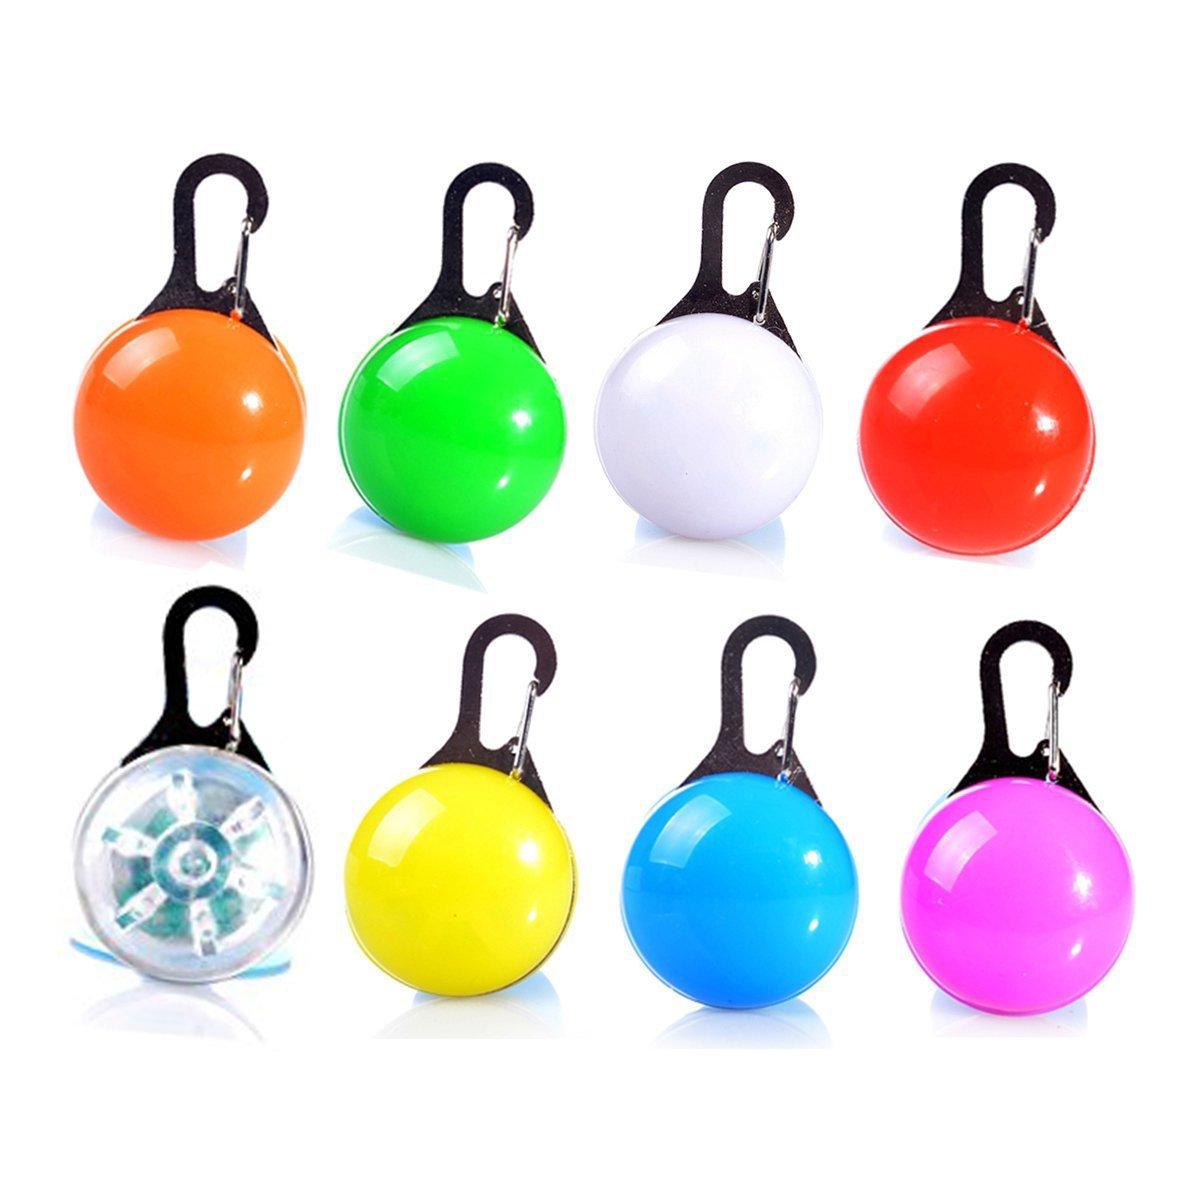 Saim High Visibility Clip-on LED Safety Light Keychain for Dog Collar, Pack of 8